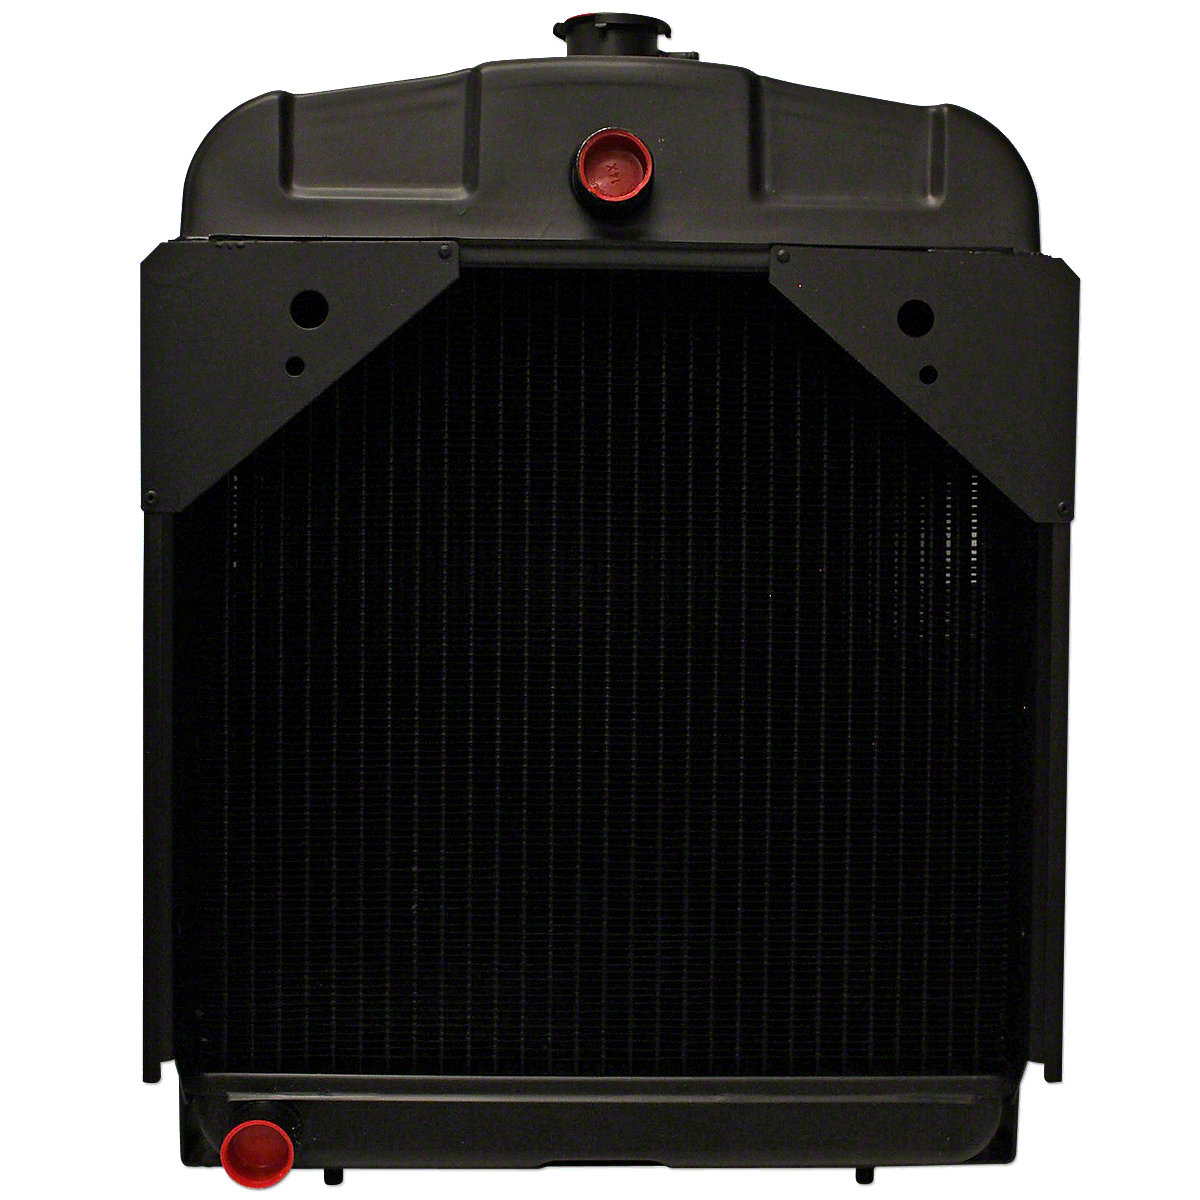 Pressurized Radiator For Allis Chalmers: B, C, CA, D10, D12, IB